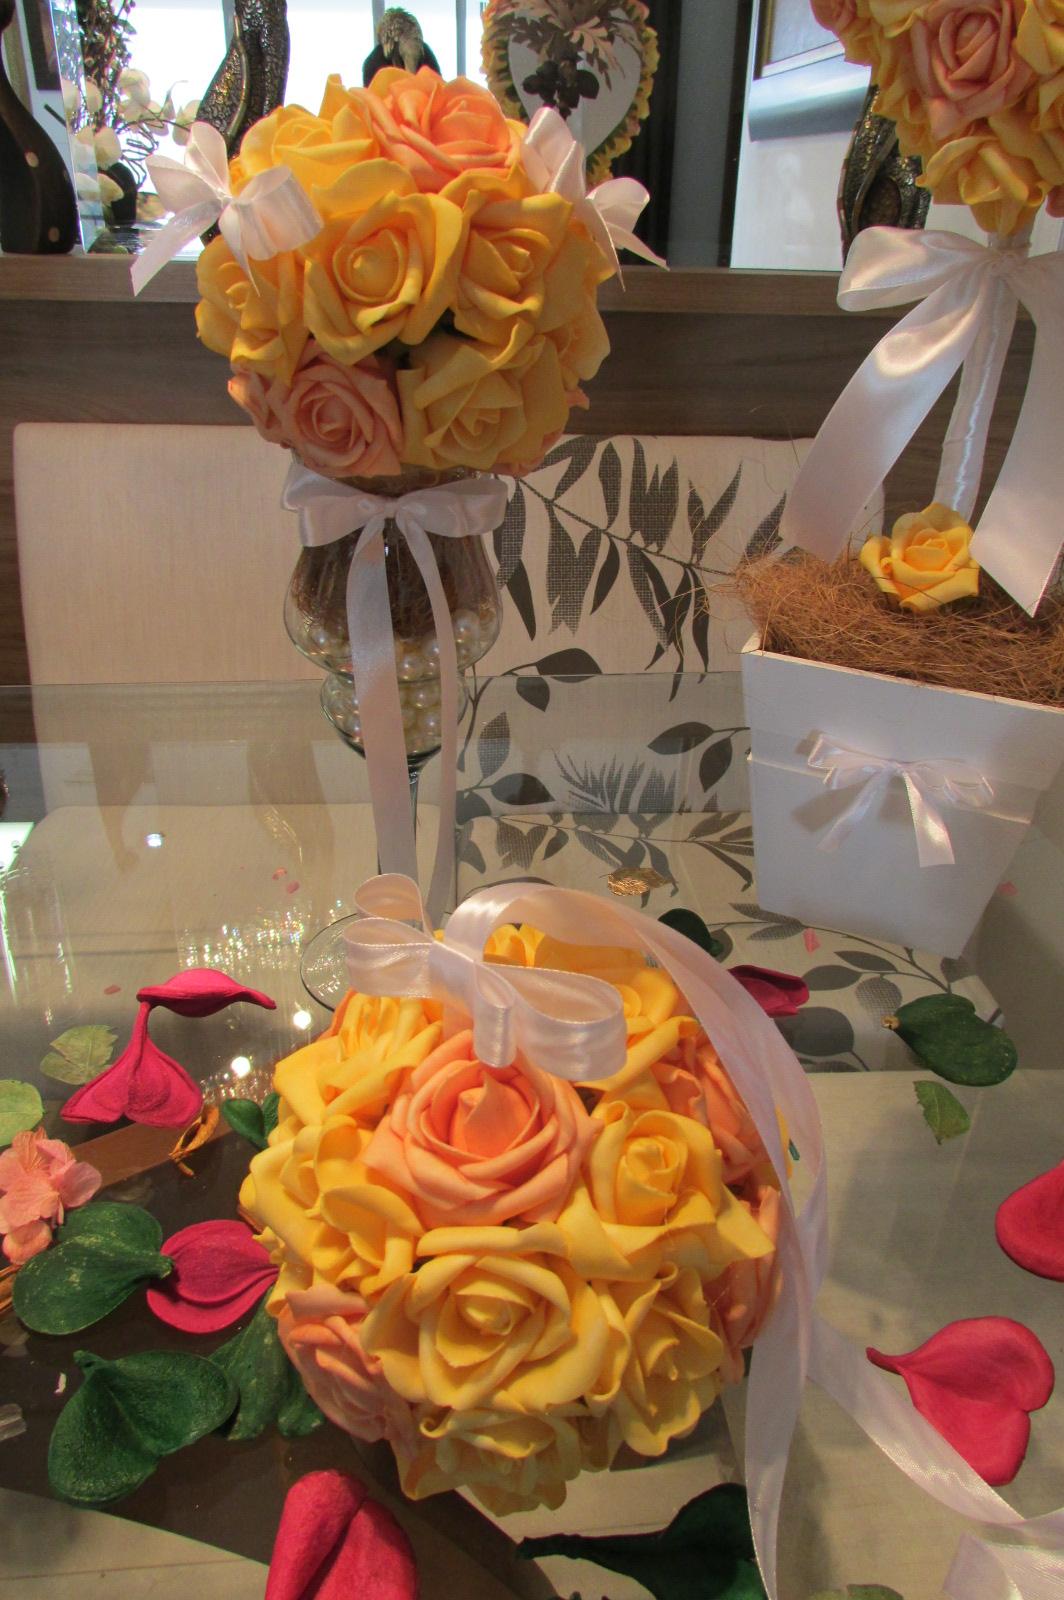 kit decoracao casamento:kit decoracao amarela para festas vi decoracao casamento kit decoracao